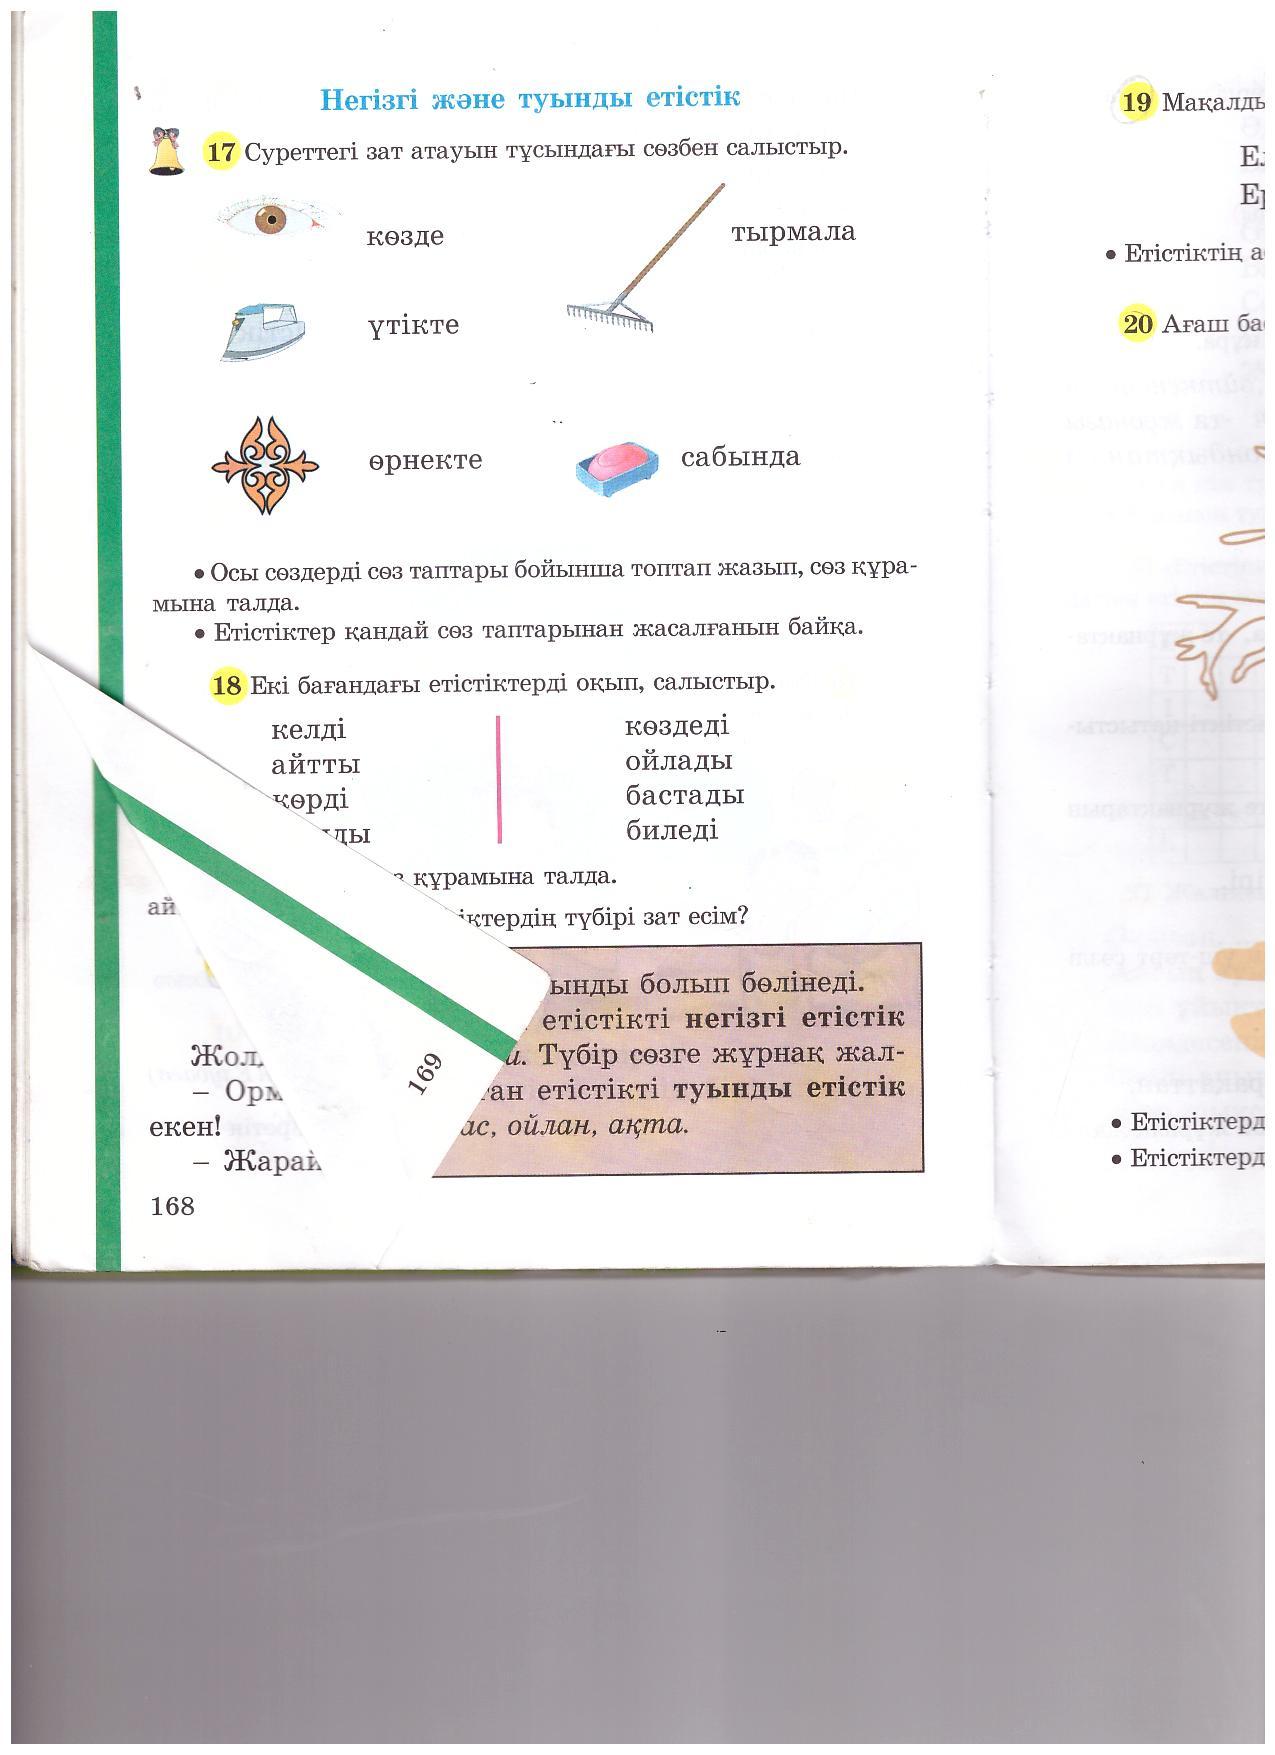 C:\Documents and Settings\User\Мои документы\Мои рисунки\Изображение 115.jpg